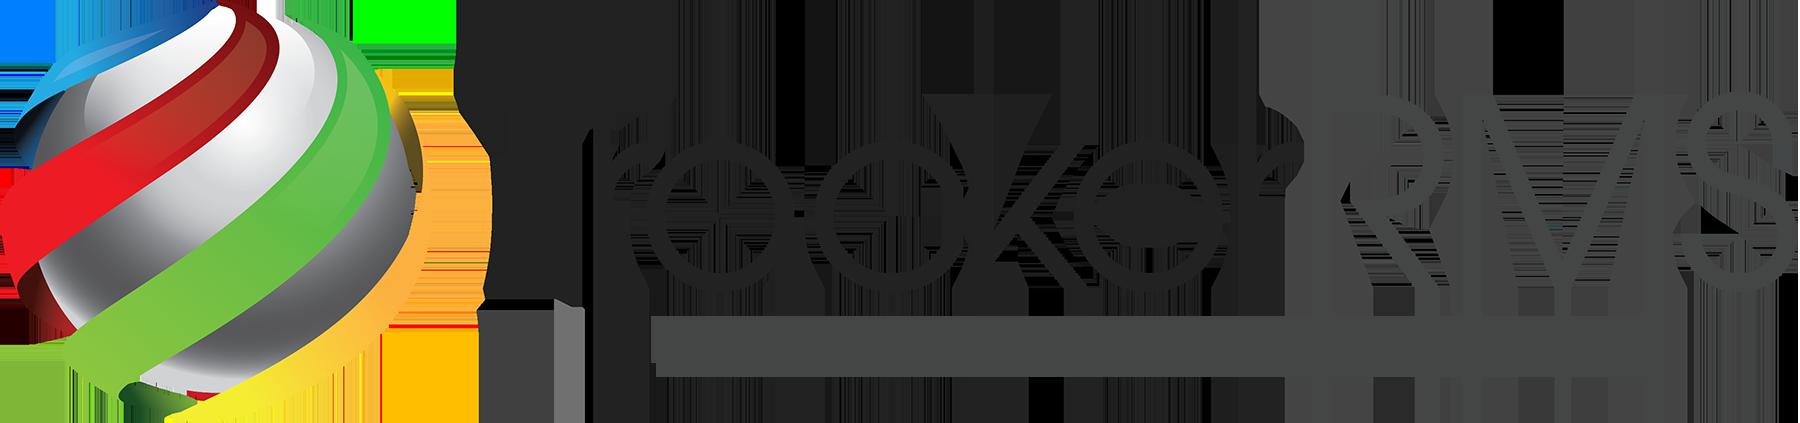 tracker rms logo